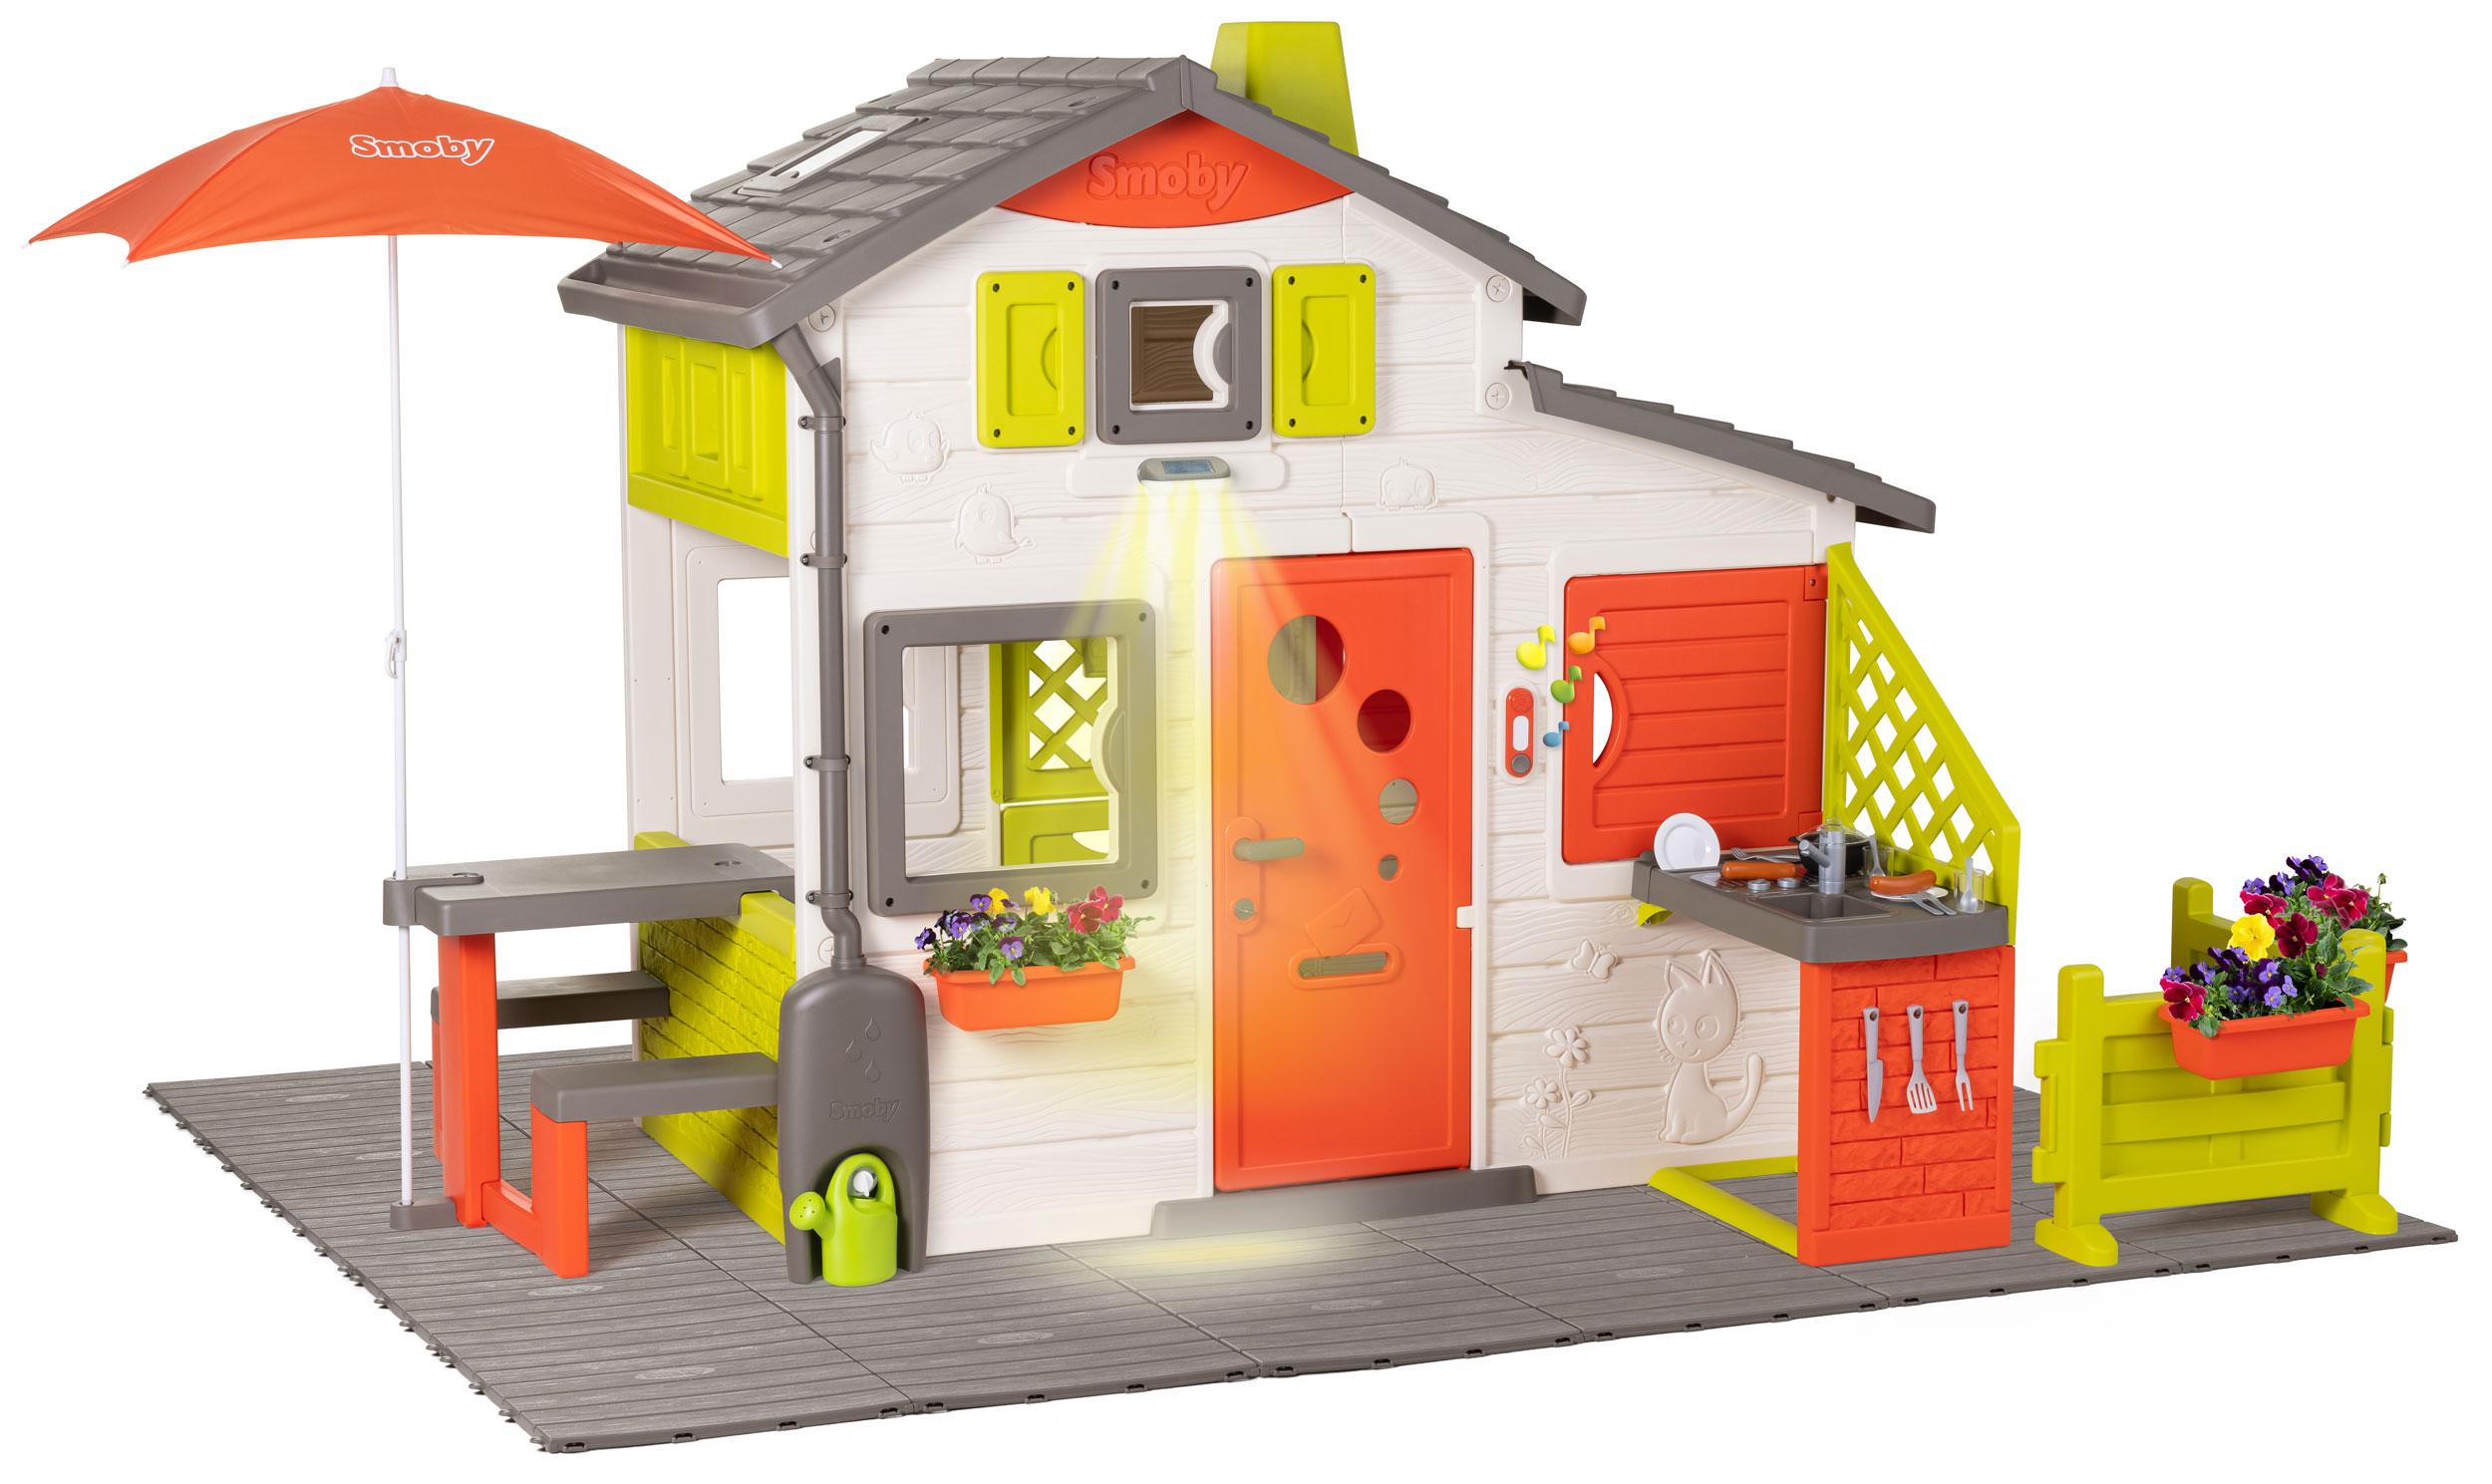 Domček Neo Friends House DeLuxe Smoby s posedením pod slnečníkom na záhrade a kuchynkou